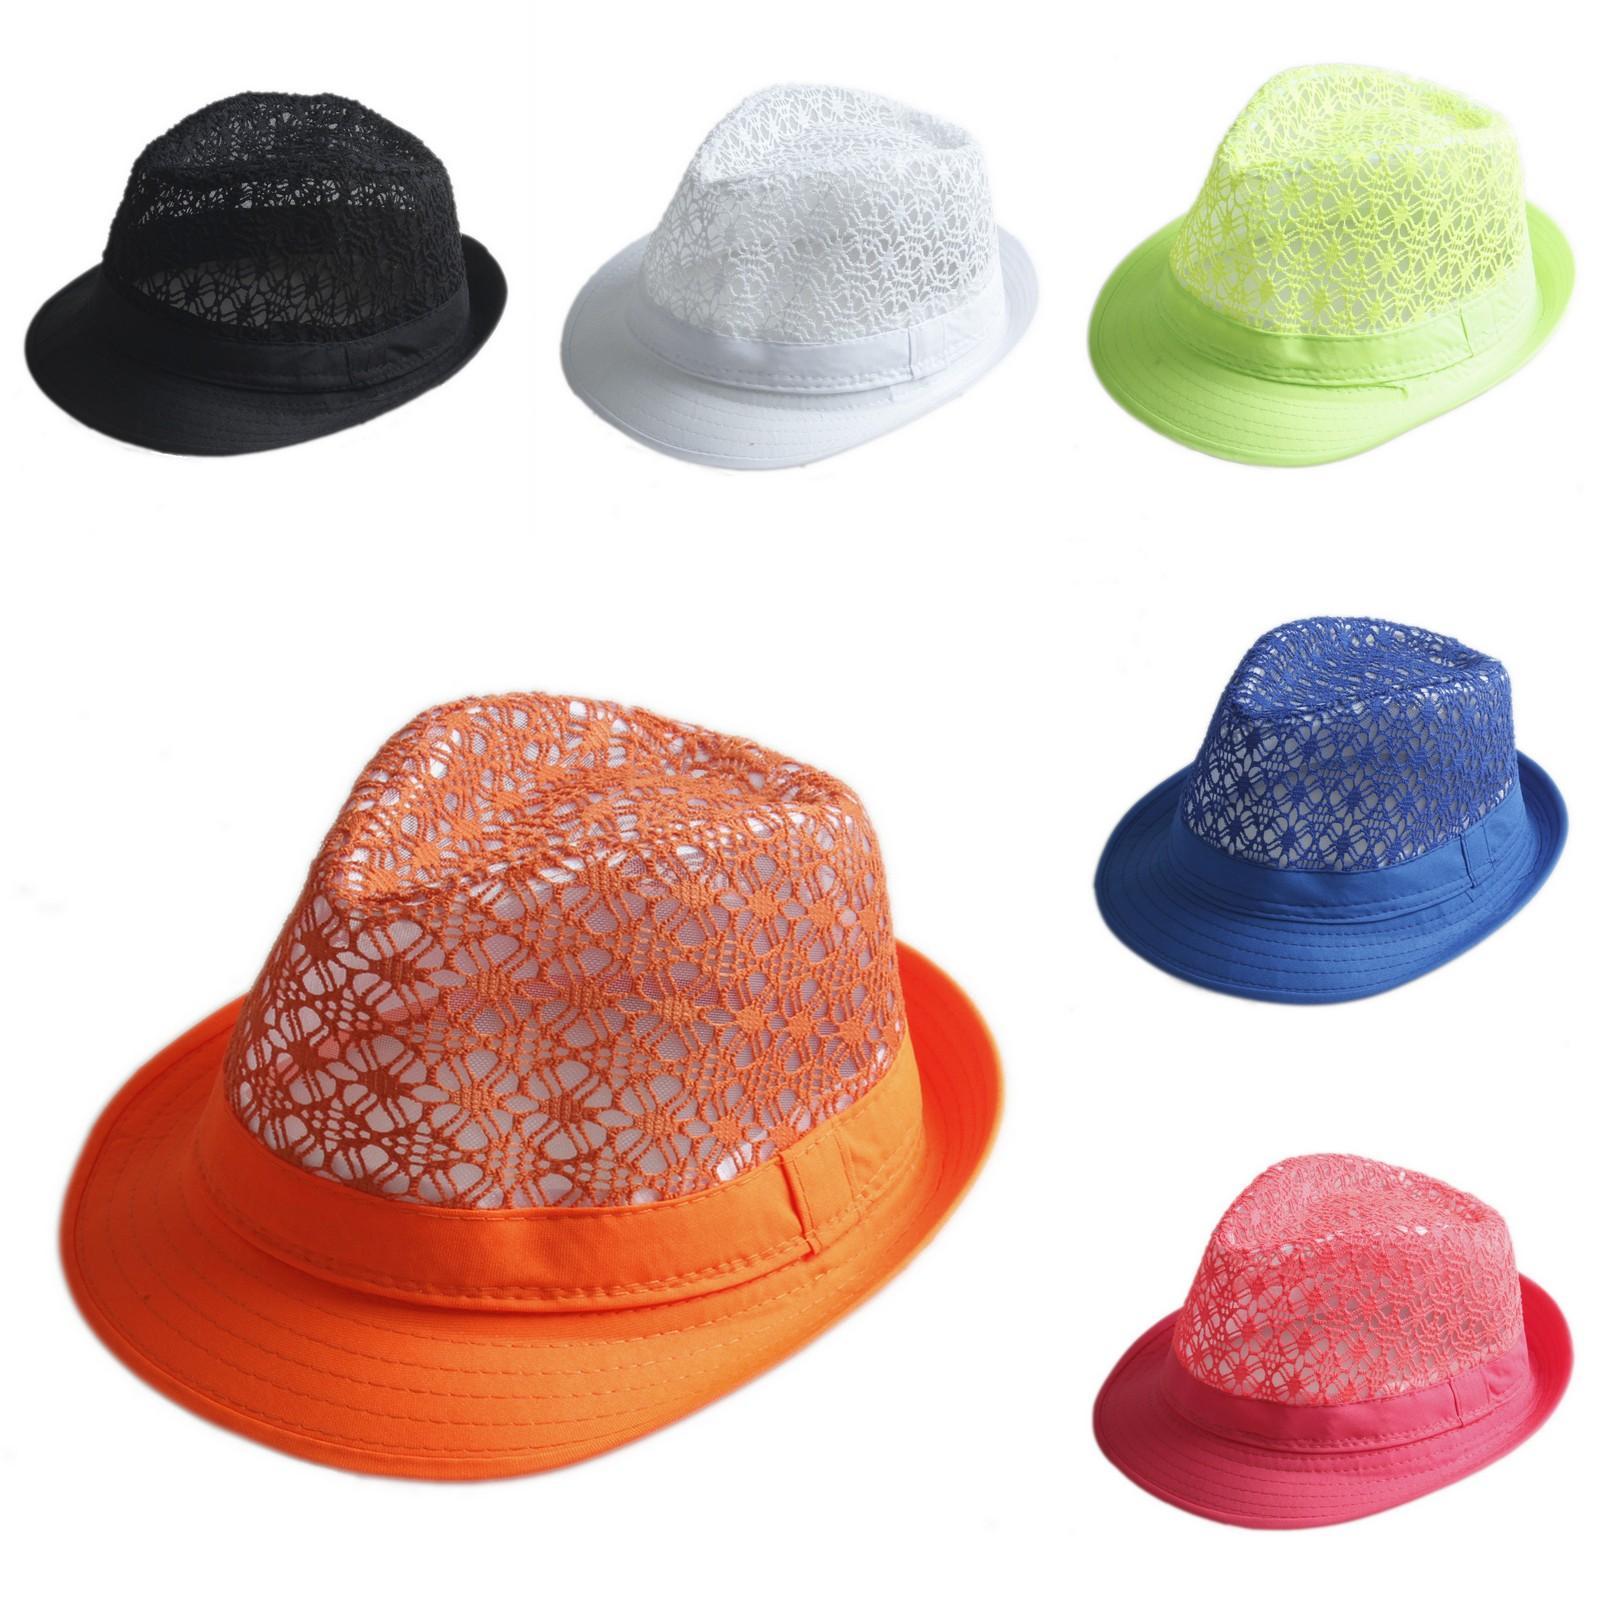 bc9e7dfaa4e 2019 Women Men Summer Hollow Top Crown Fedora Hat Trilby Beach Jazz Cap  Cotton Blend From Artstyle